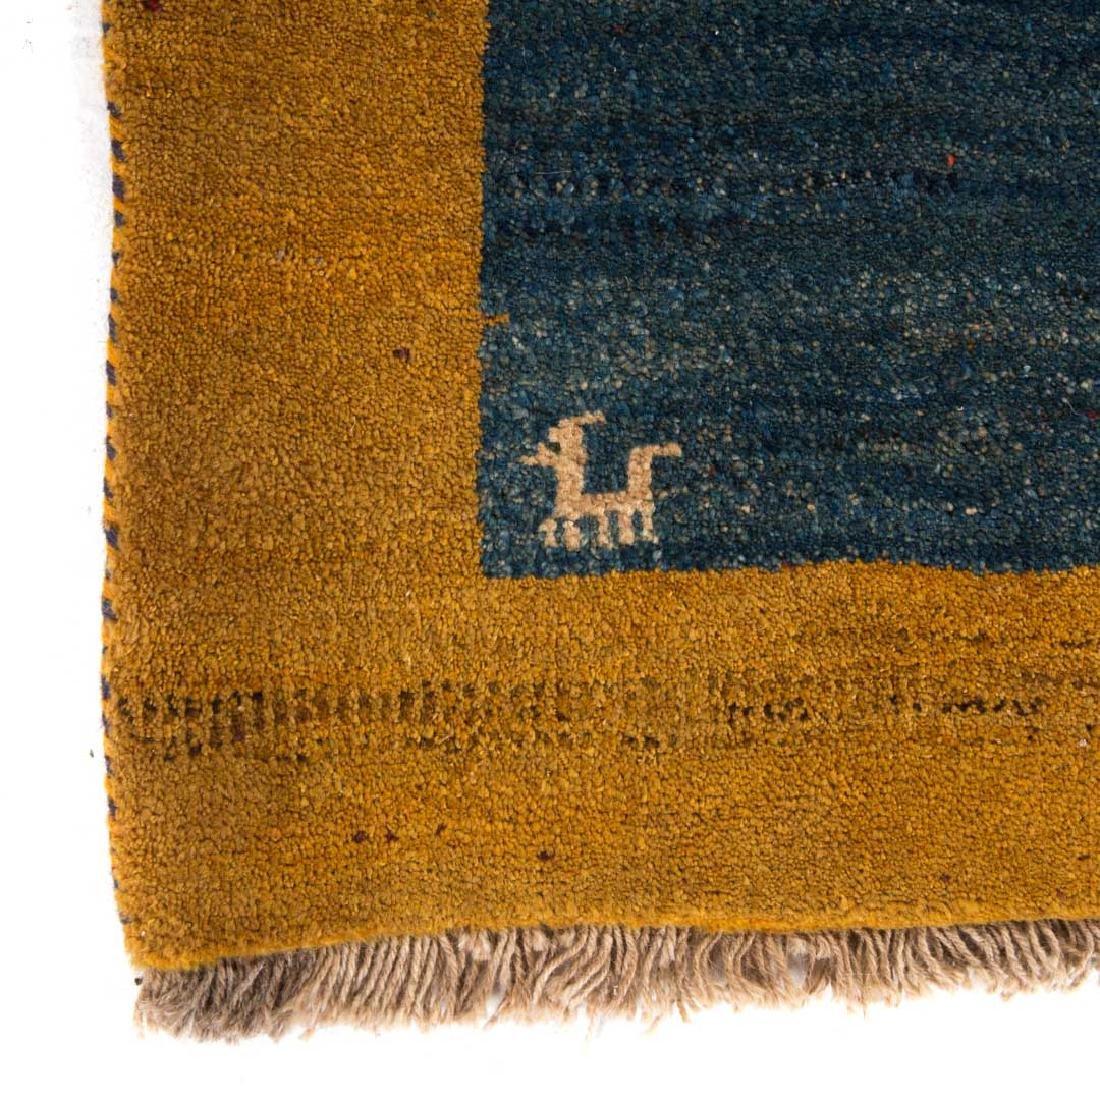 Persian Gabbeh rug, approx. 3.4 x 4.9 - 2